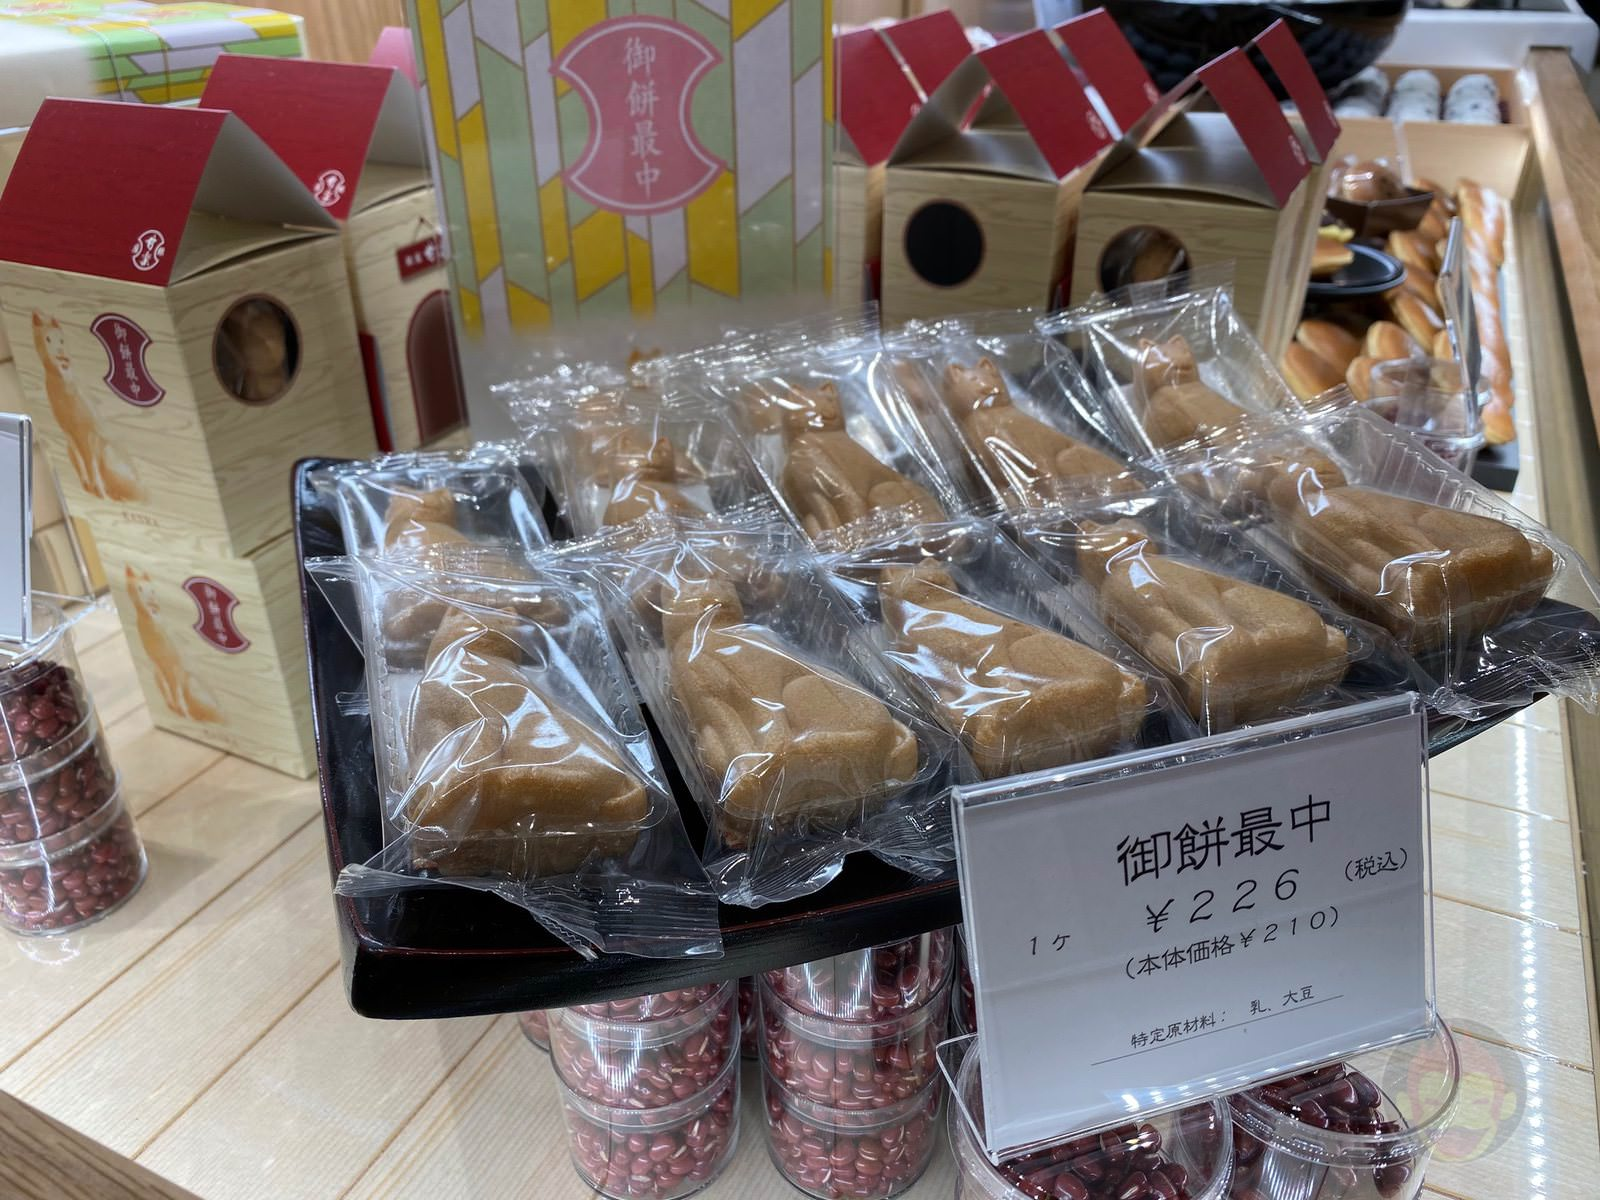 Shibuya-Scramble-Square-Food-I-Ate-42.jpeg